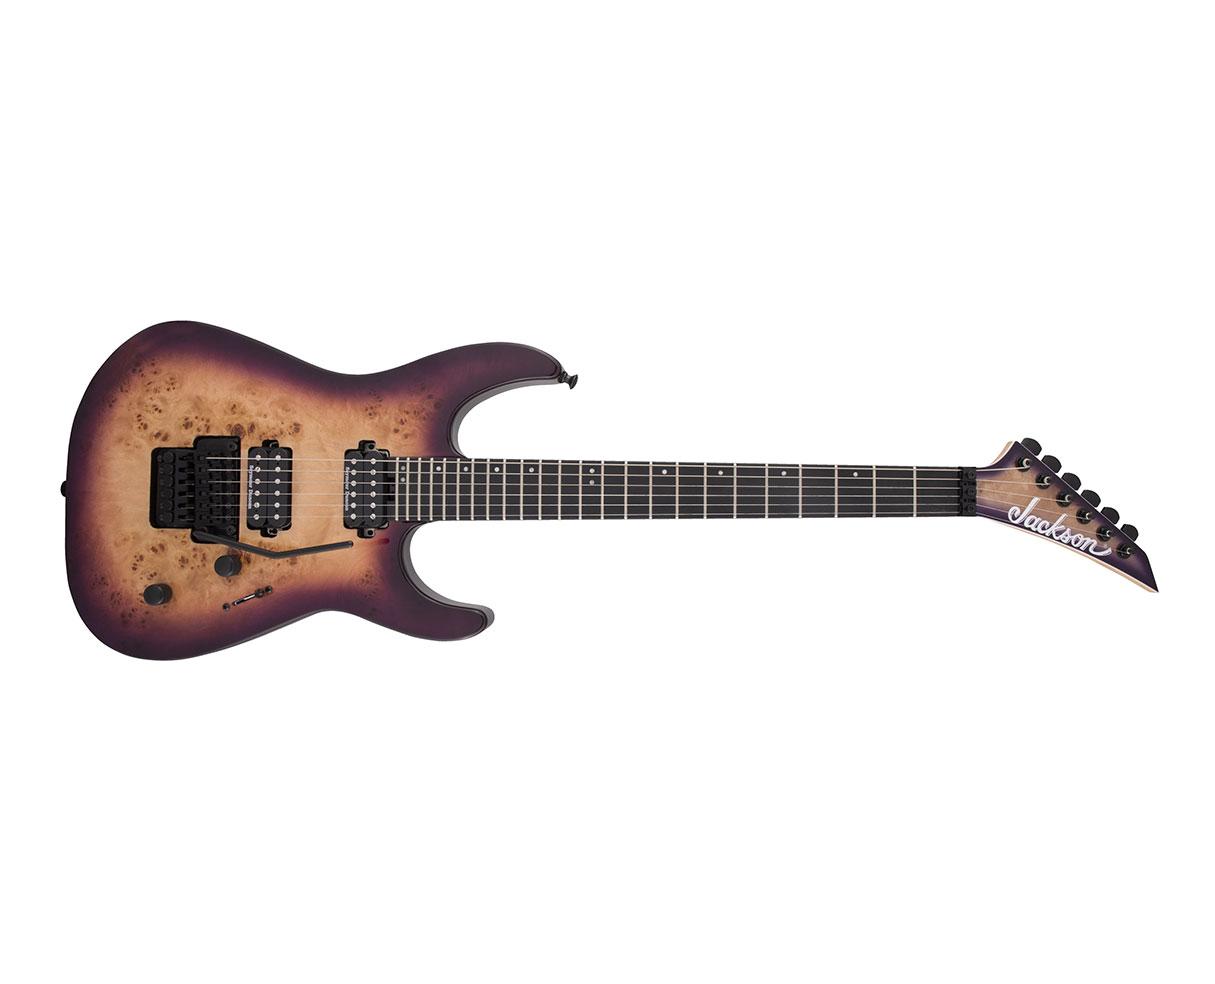 JACKSON-Pro-Series-Dinky-DK2P-EB-Purple-Sunset-2914116535-sku-24037